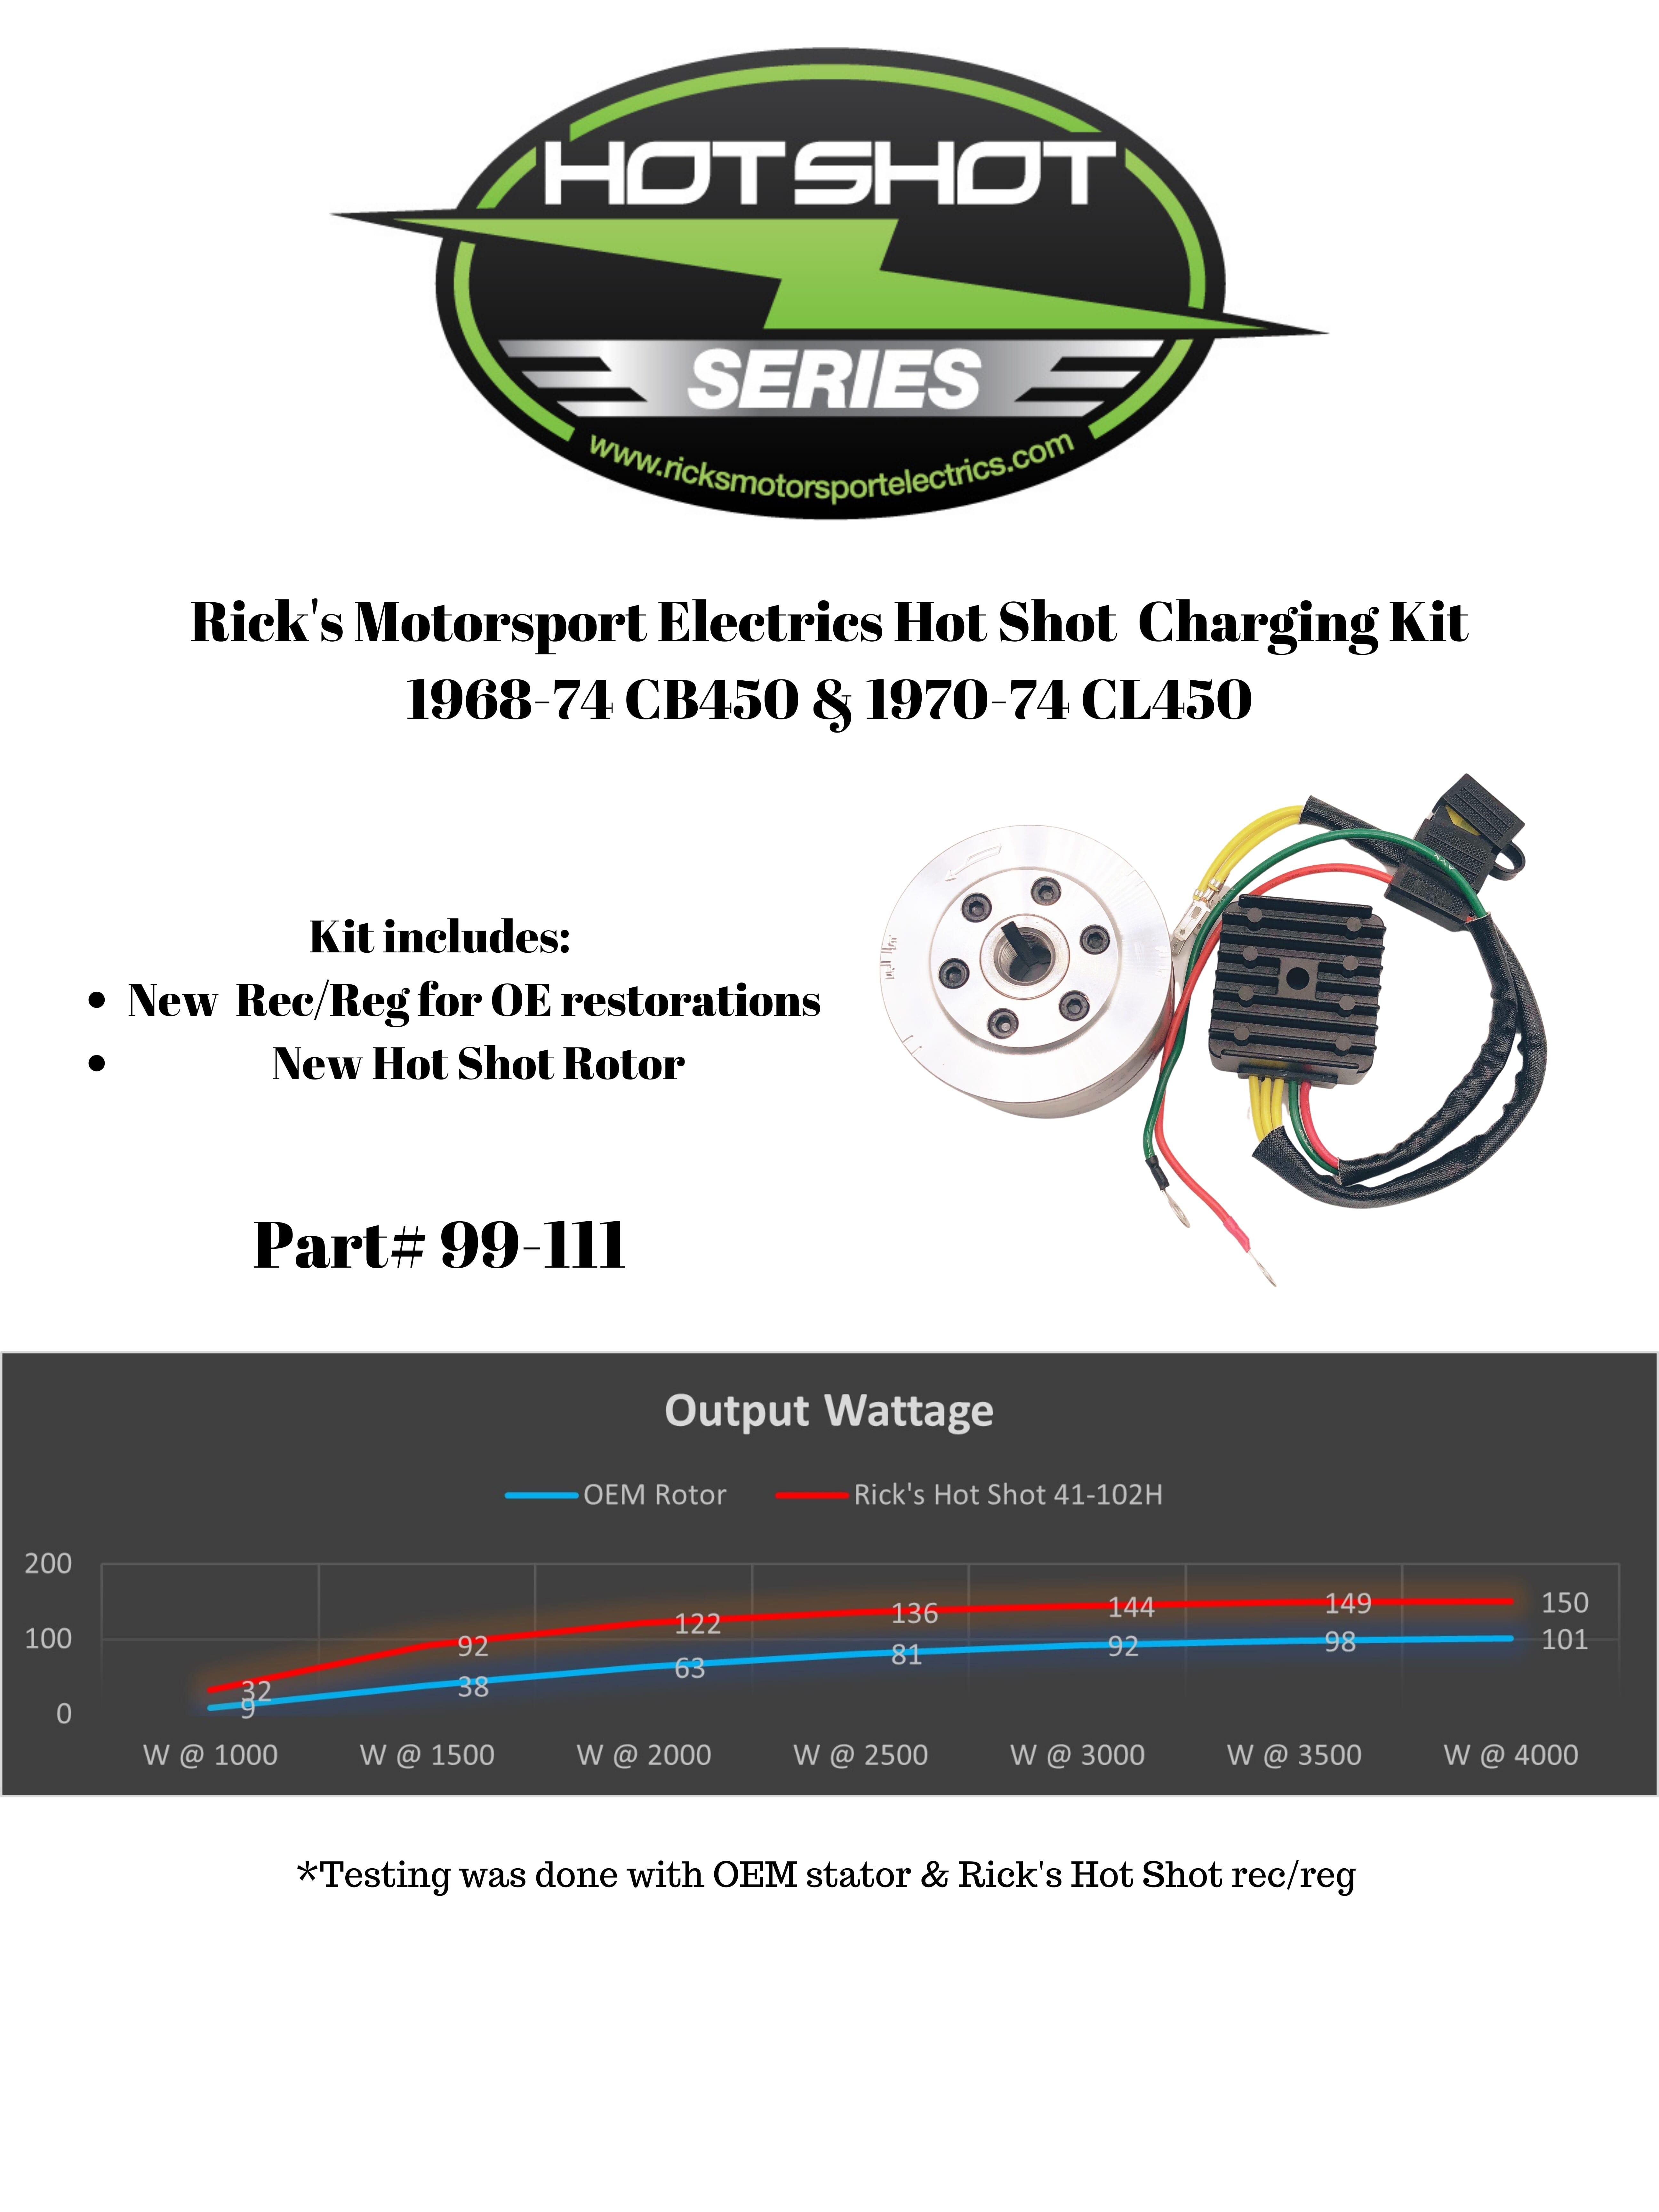 New Honda Charging Kit 99_111